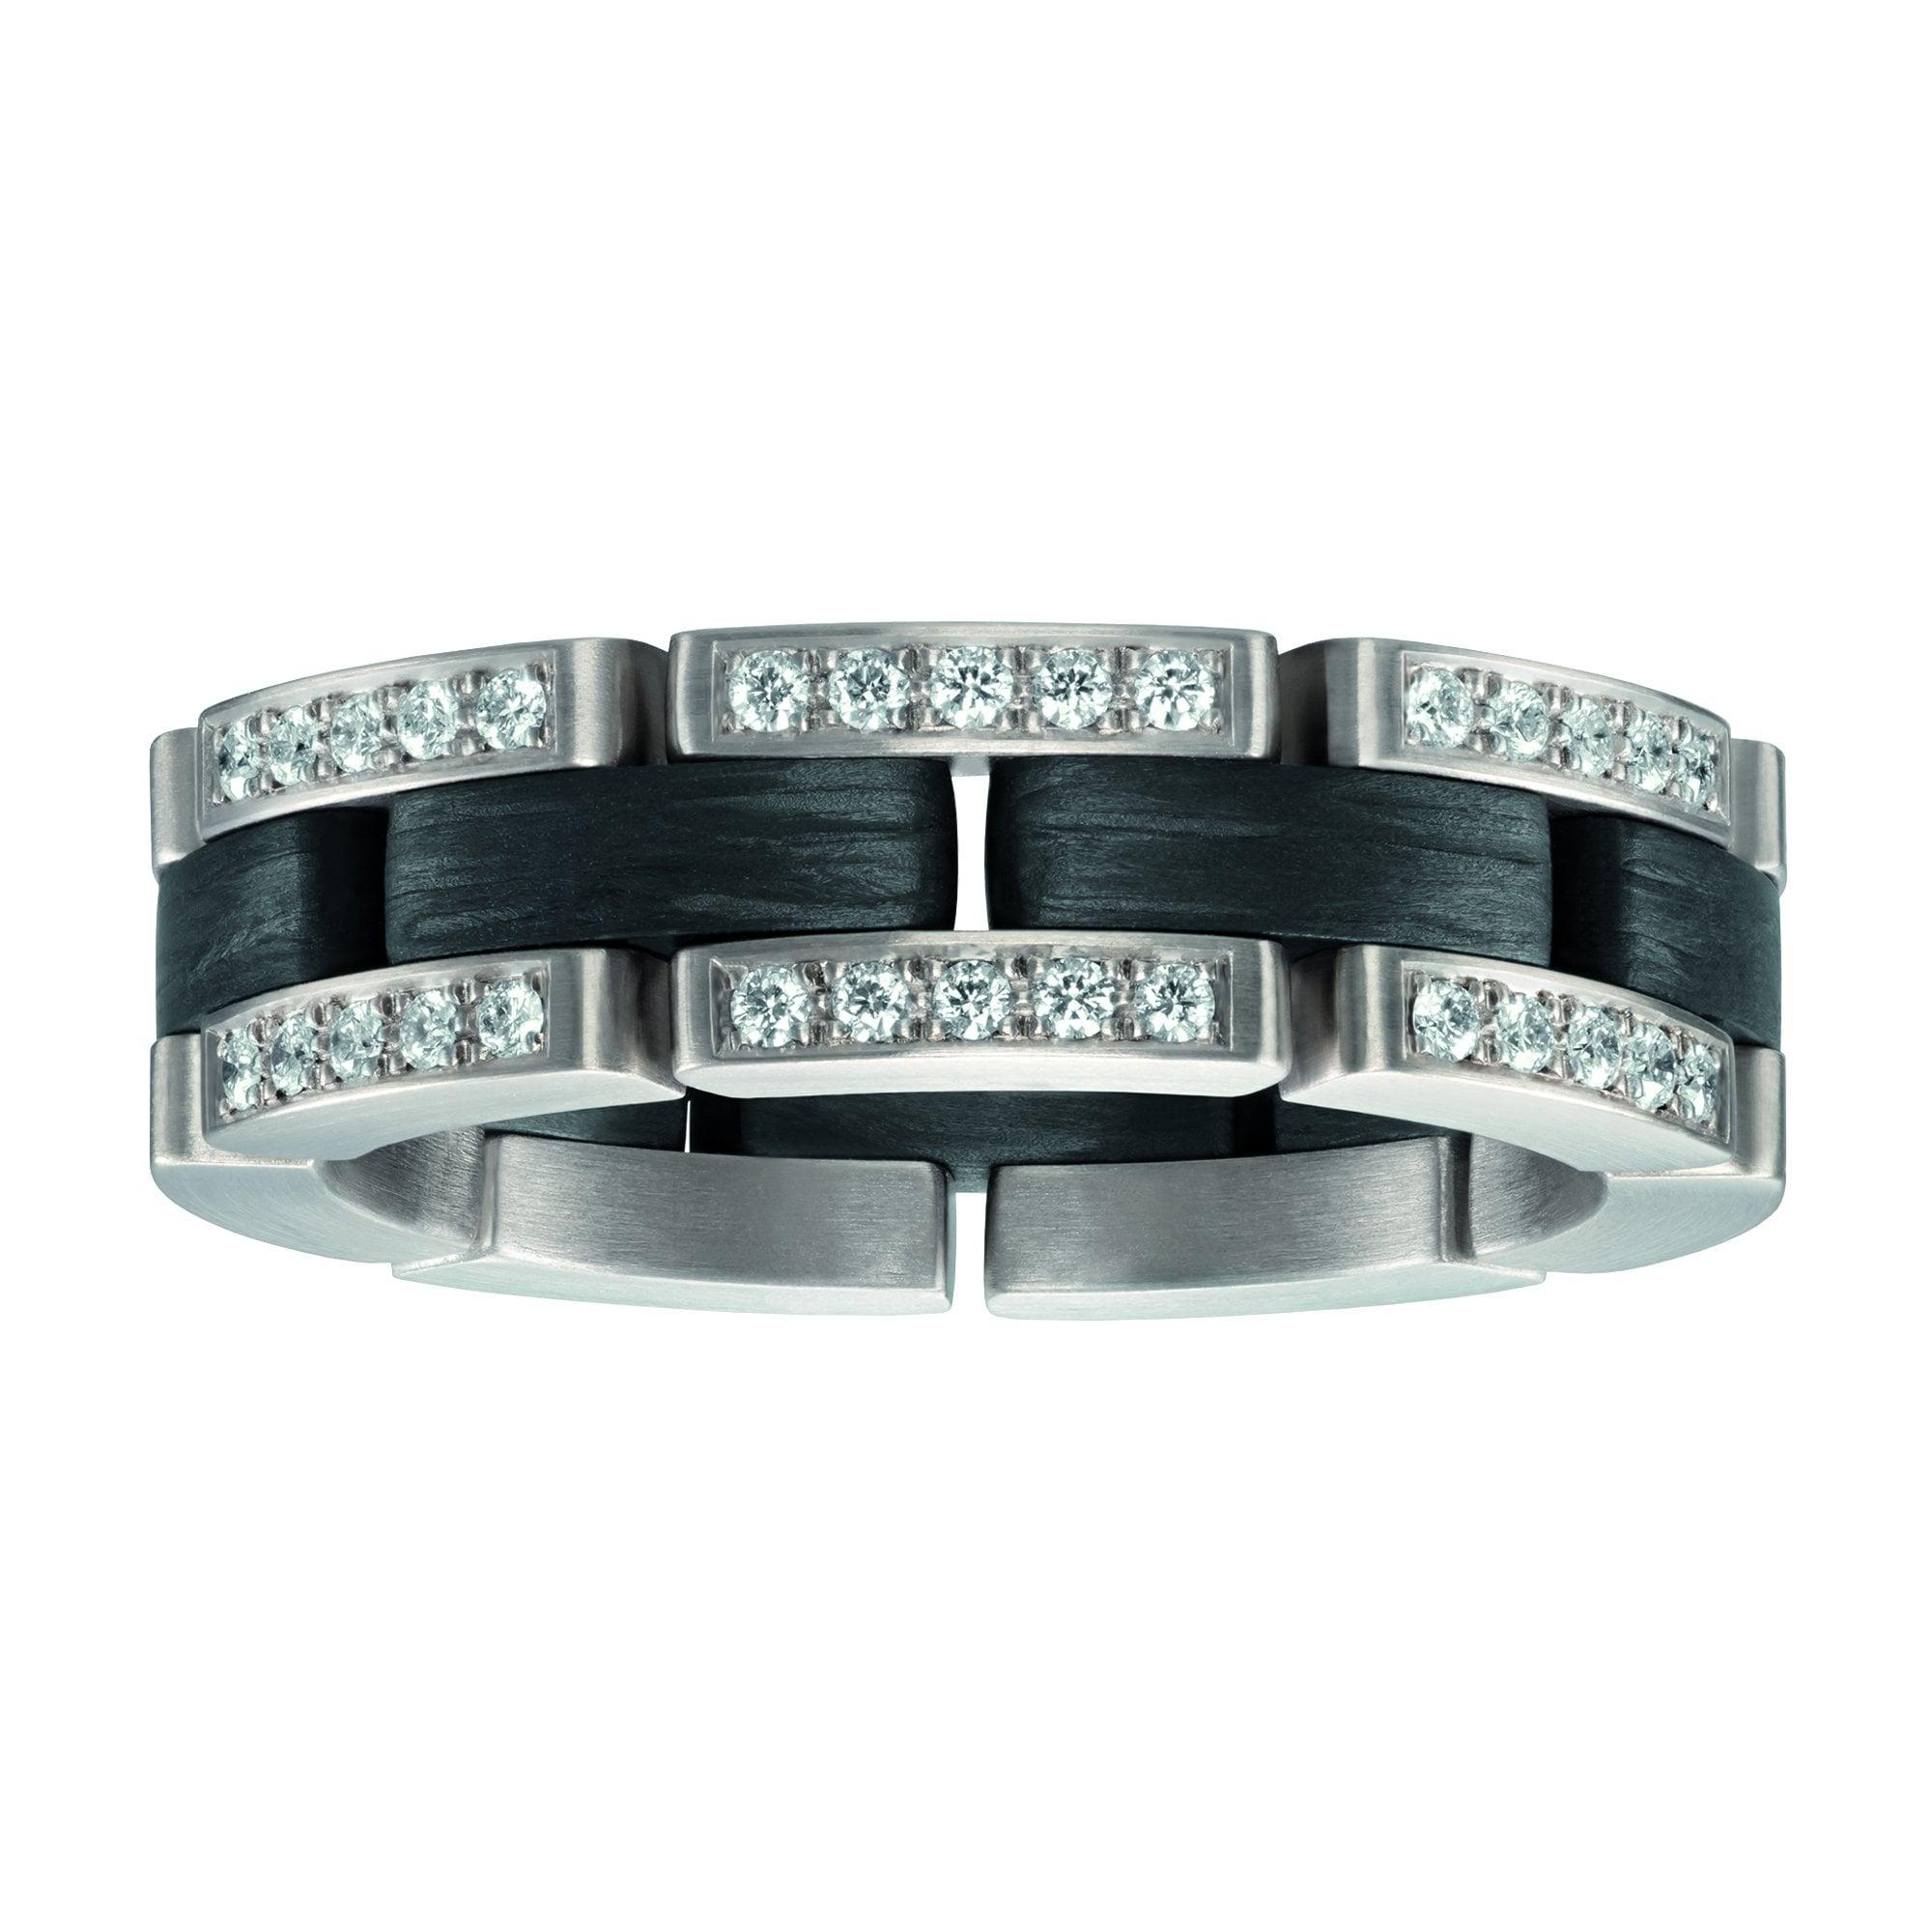 Furrer Jacot Flexible Link Ring With Carbon Fibre Diamonds